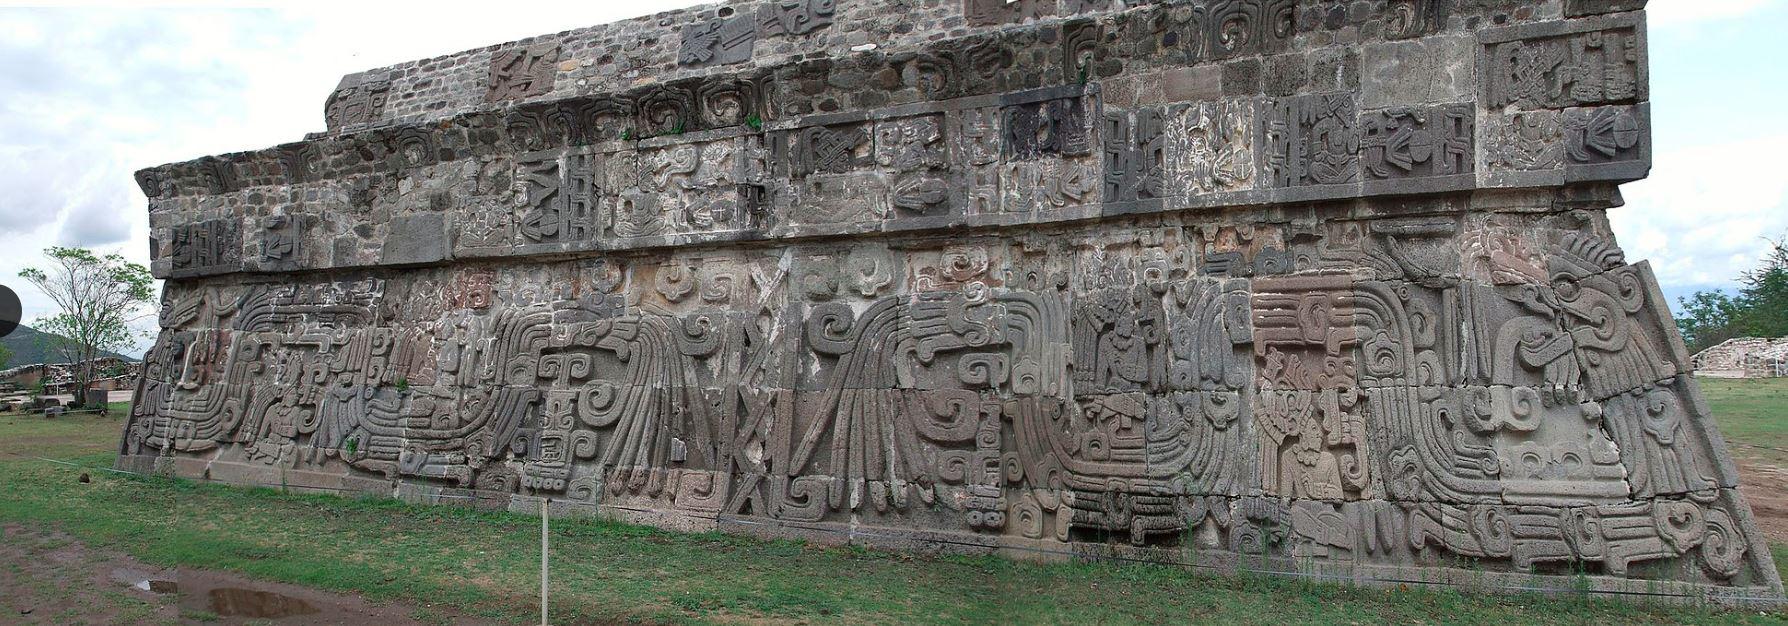 ormen Quetzalcoatls